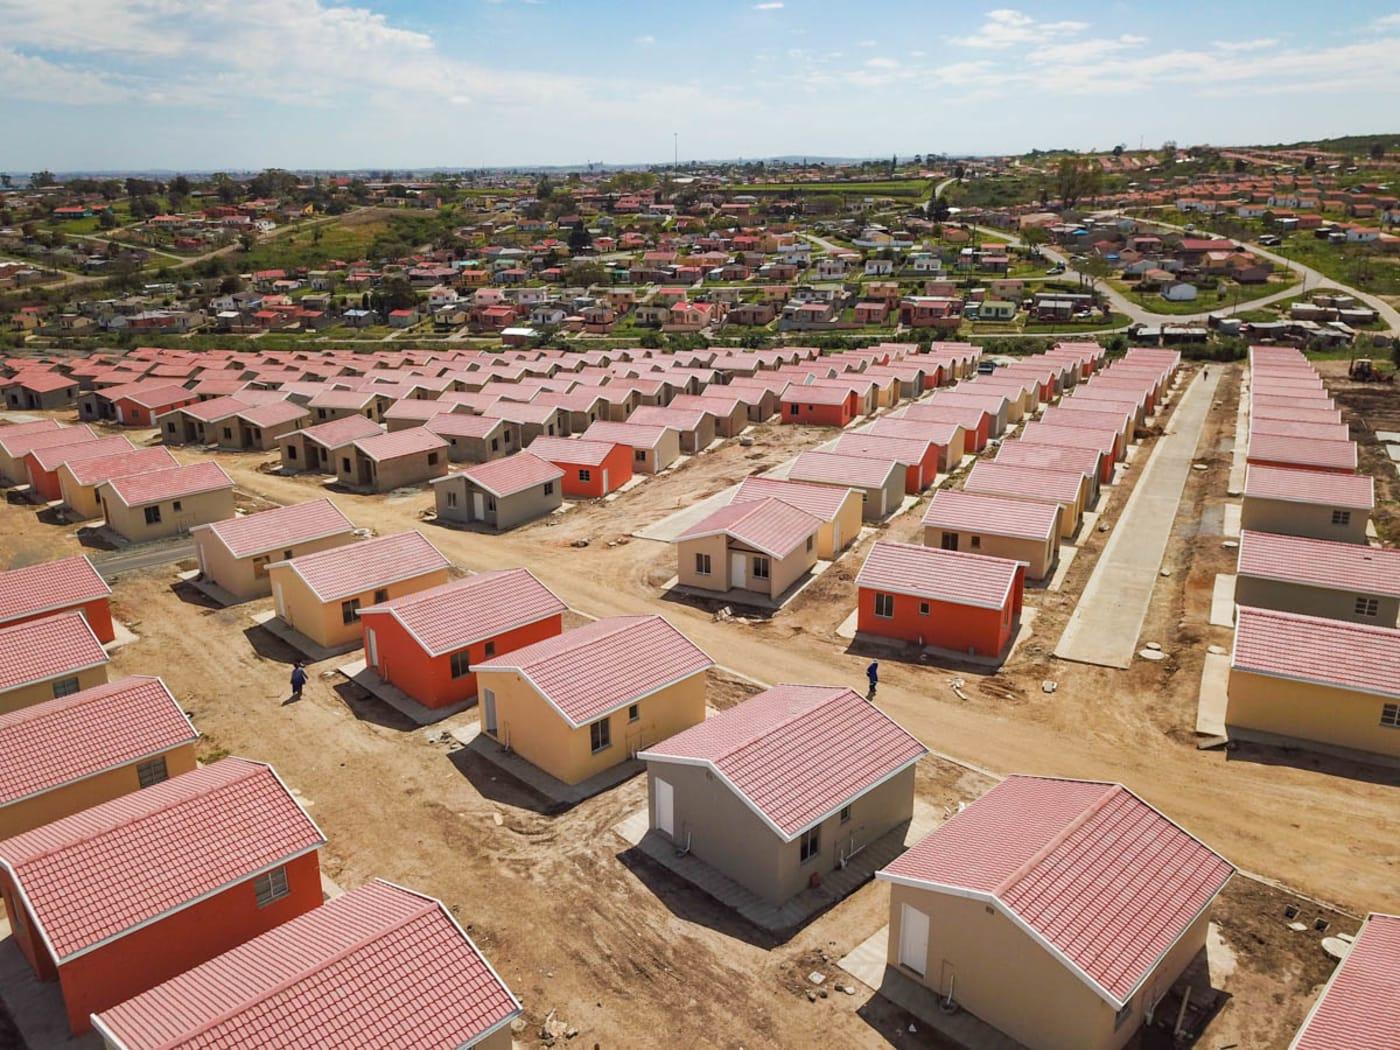 Mdantsane Housing Project and Civil Services